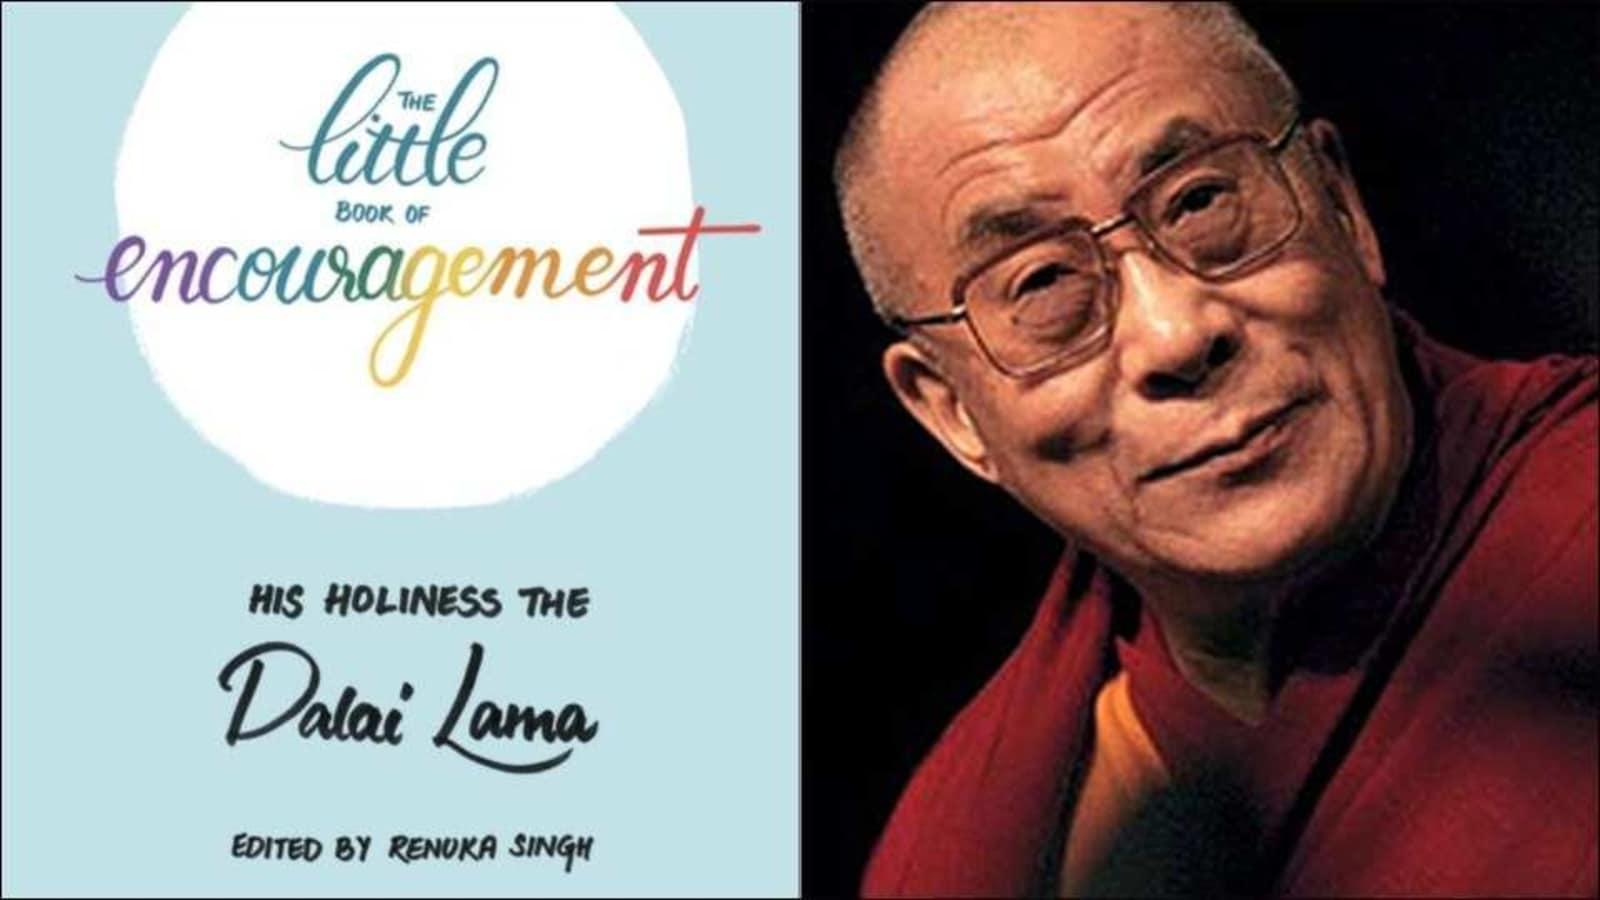 Dalai Lama Quote On Covid